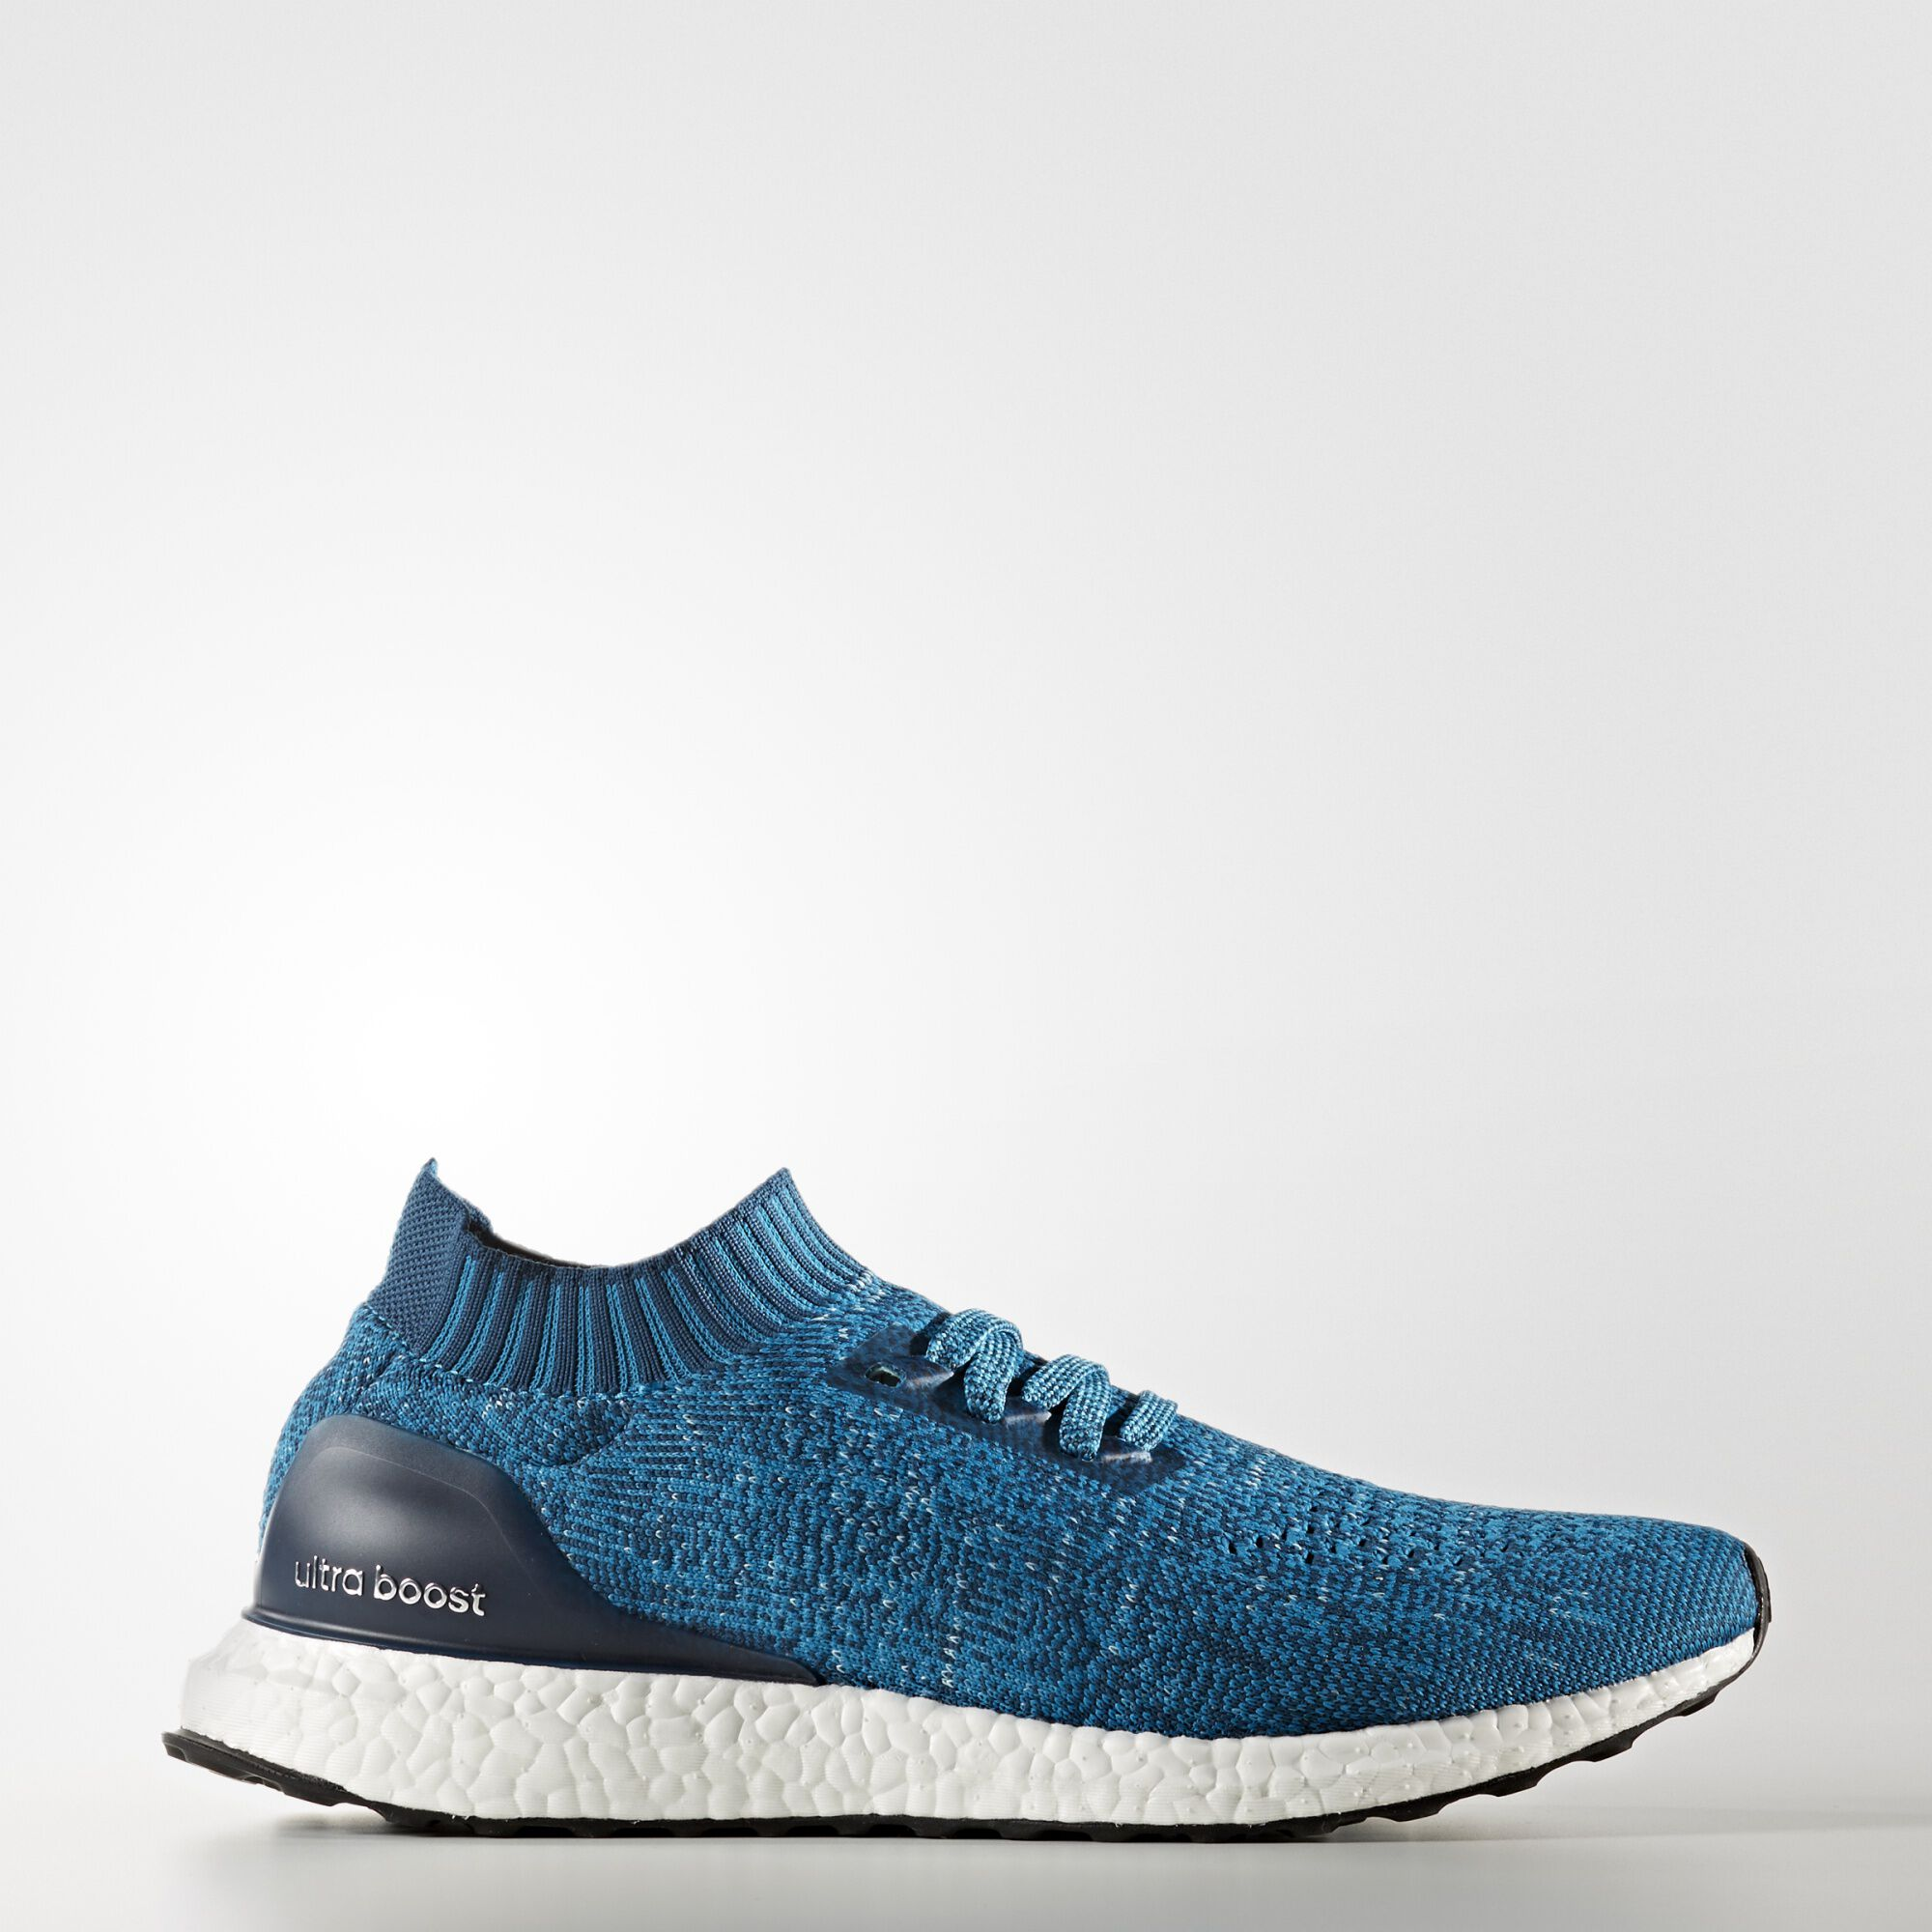 Adidas Bounce Titan V Running Shoes Blue Womens Pink Silver Revolutionary